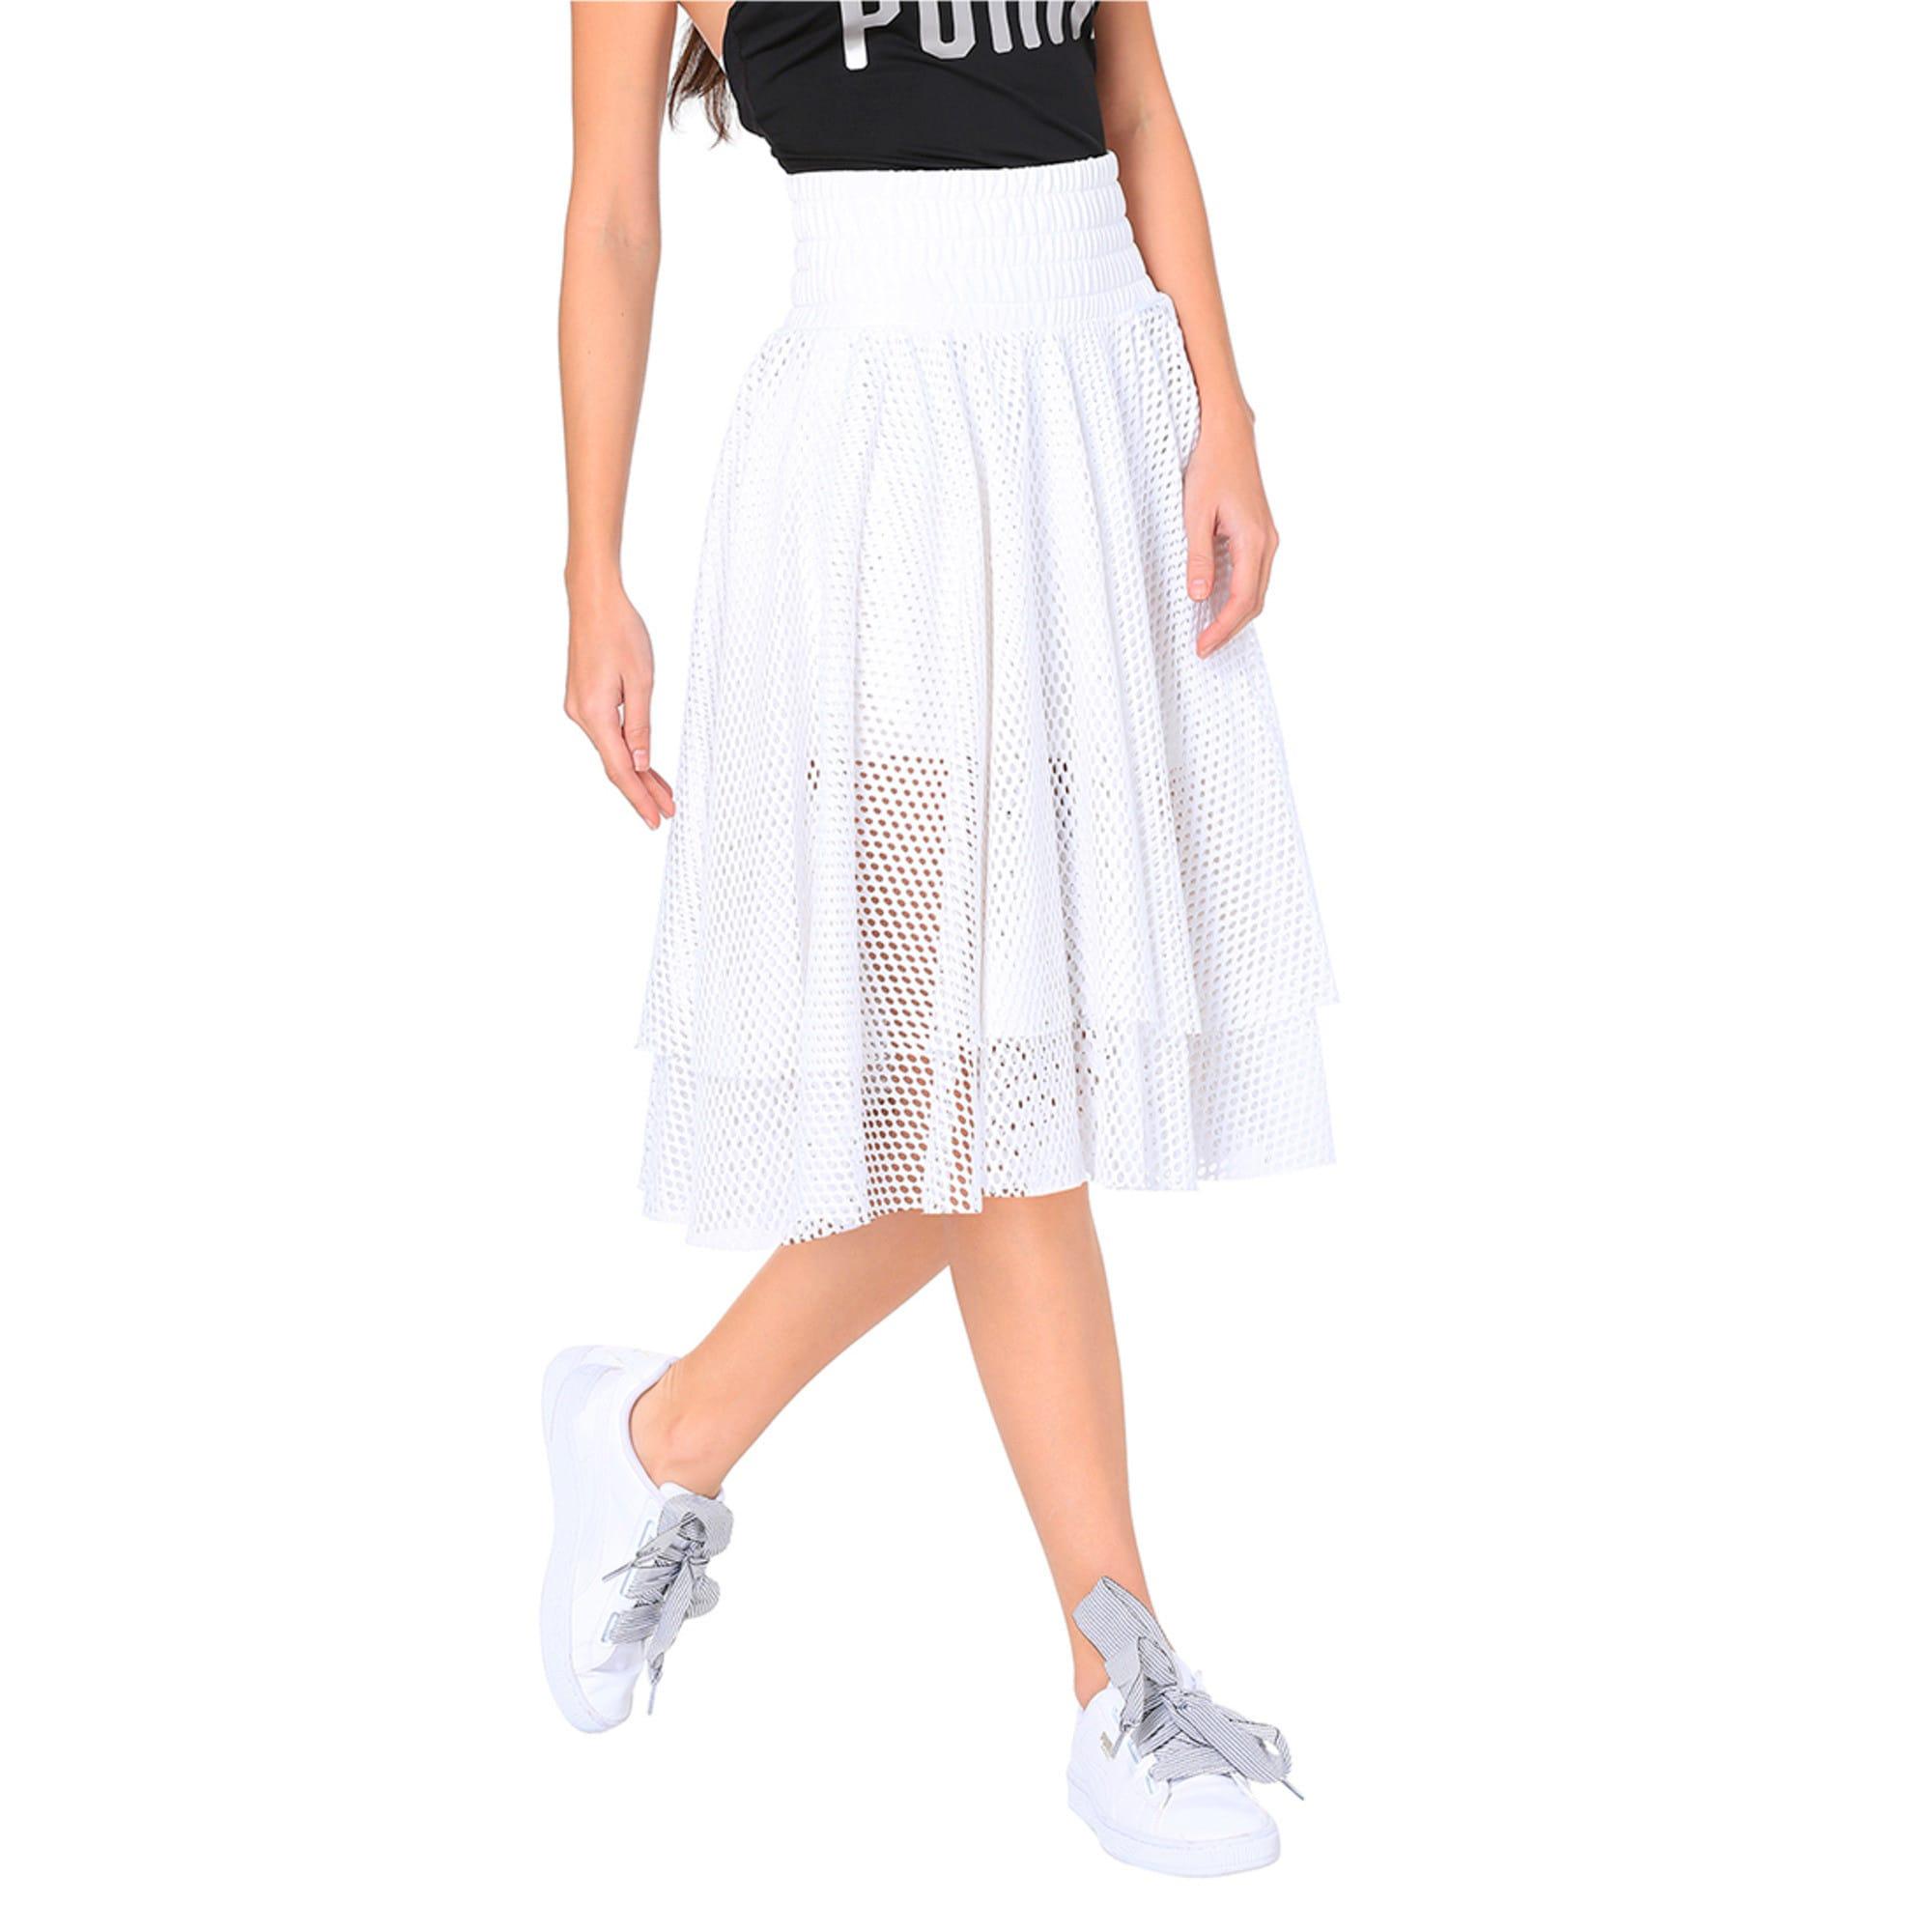 Thumbnail 2 of En Pointe Women's Skirt, Puma White, medium-IND